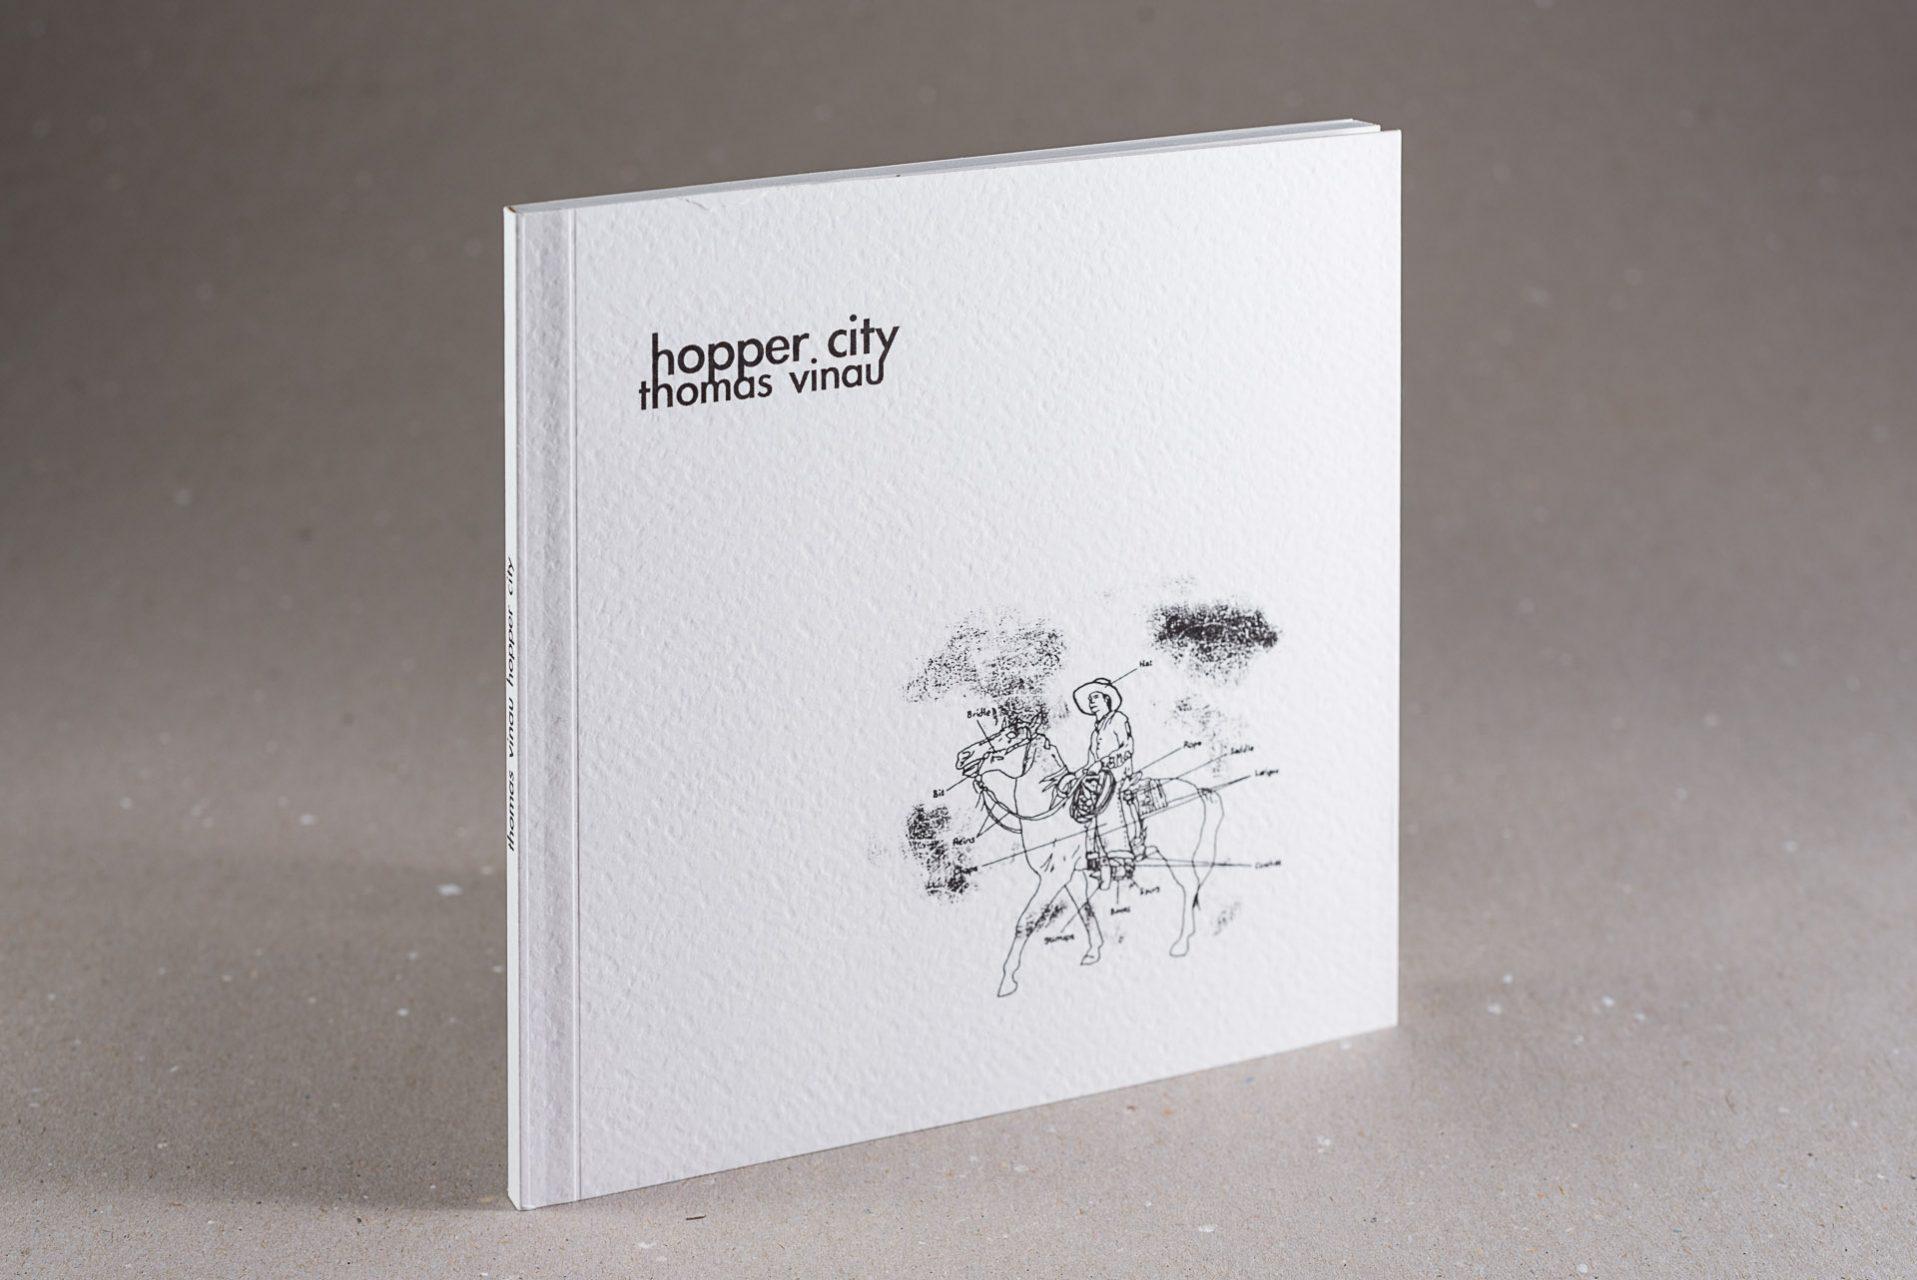 web-hd-nuit-myrtide-livre-hopper-city-thomas-vinau-01